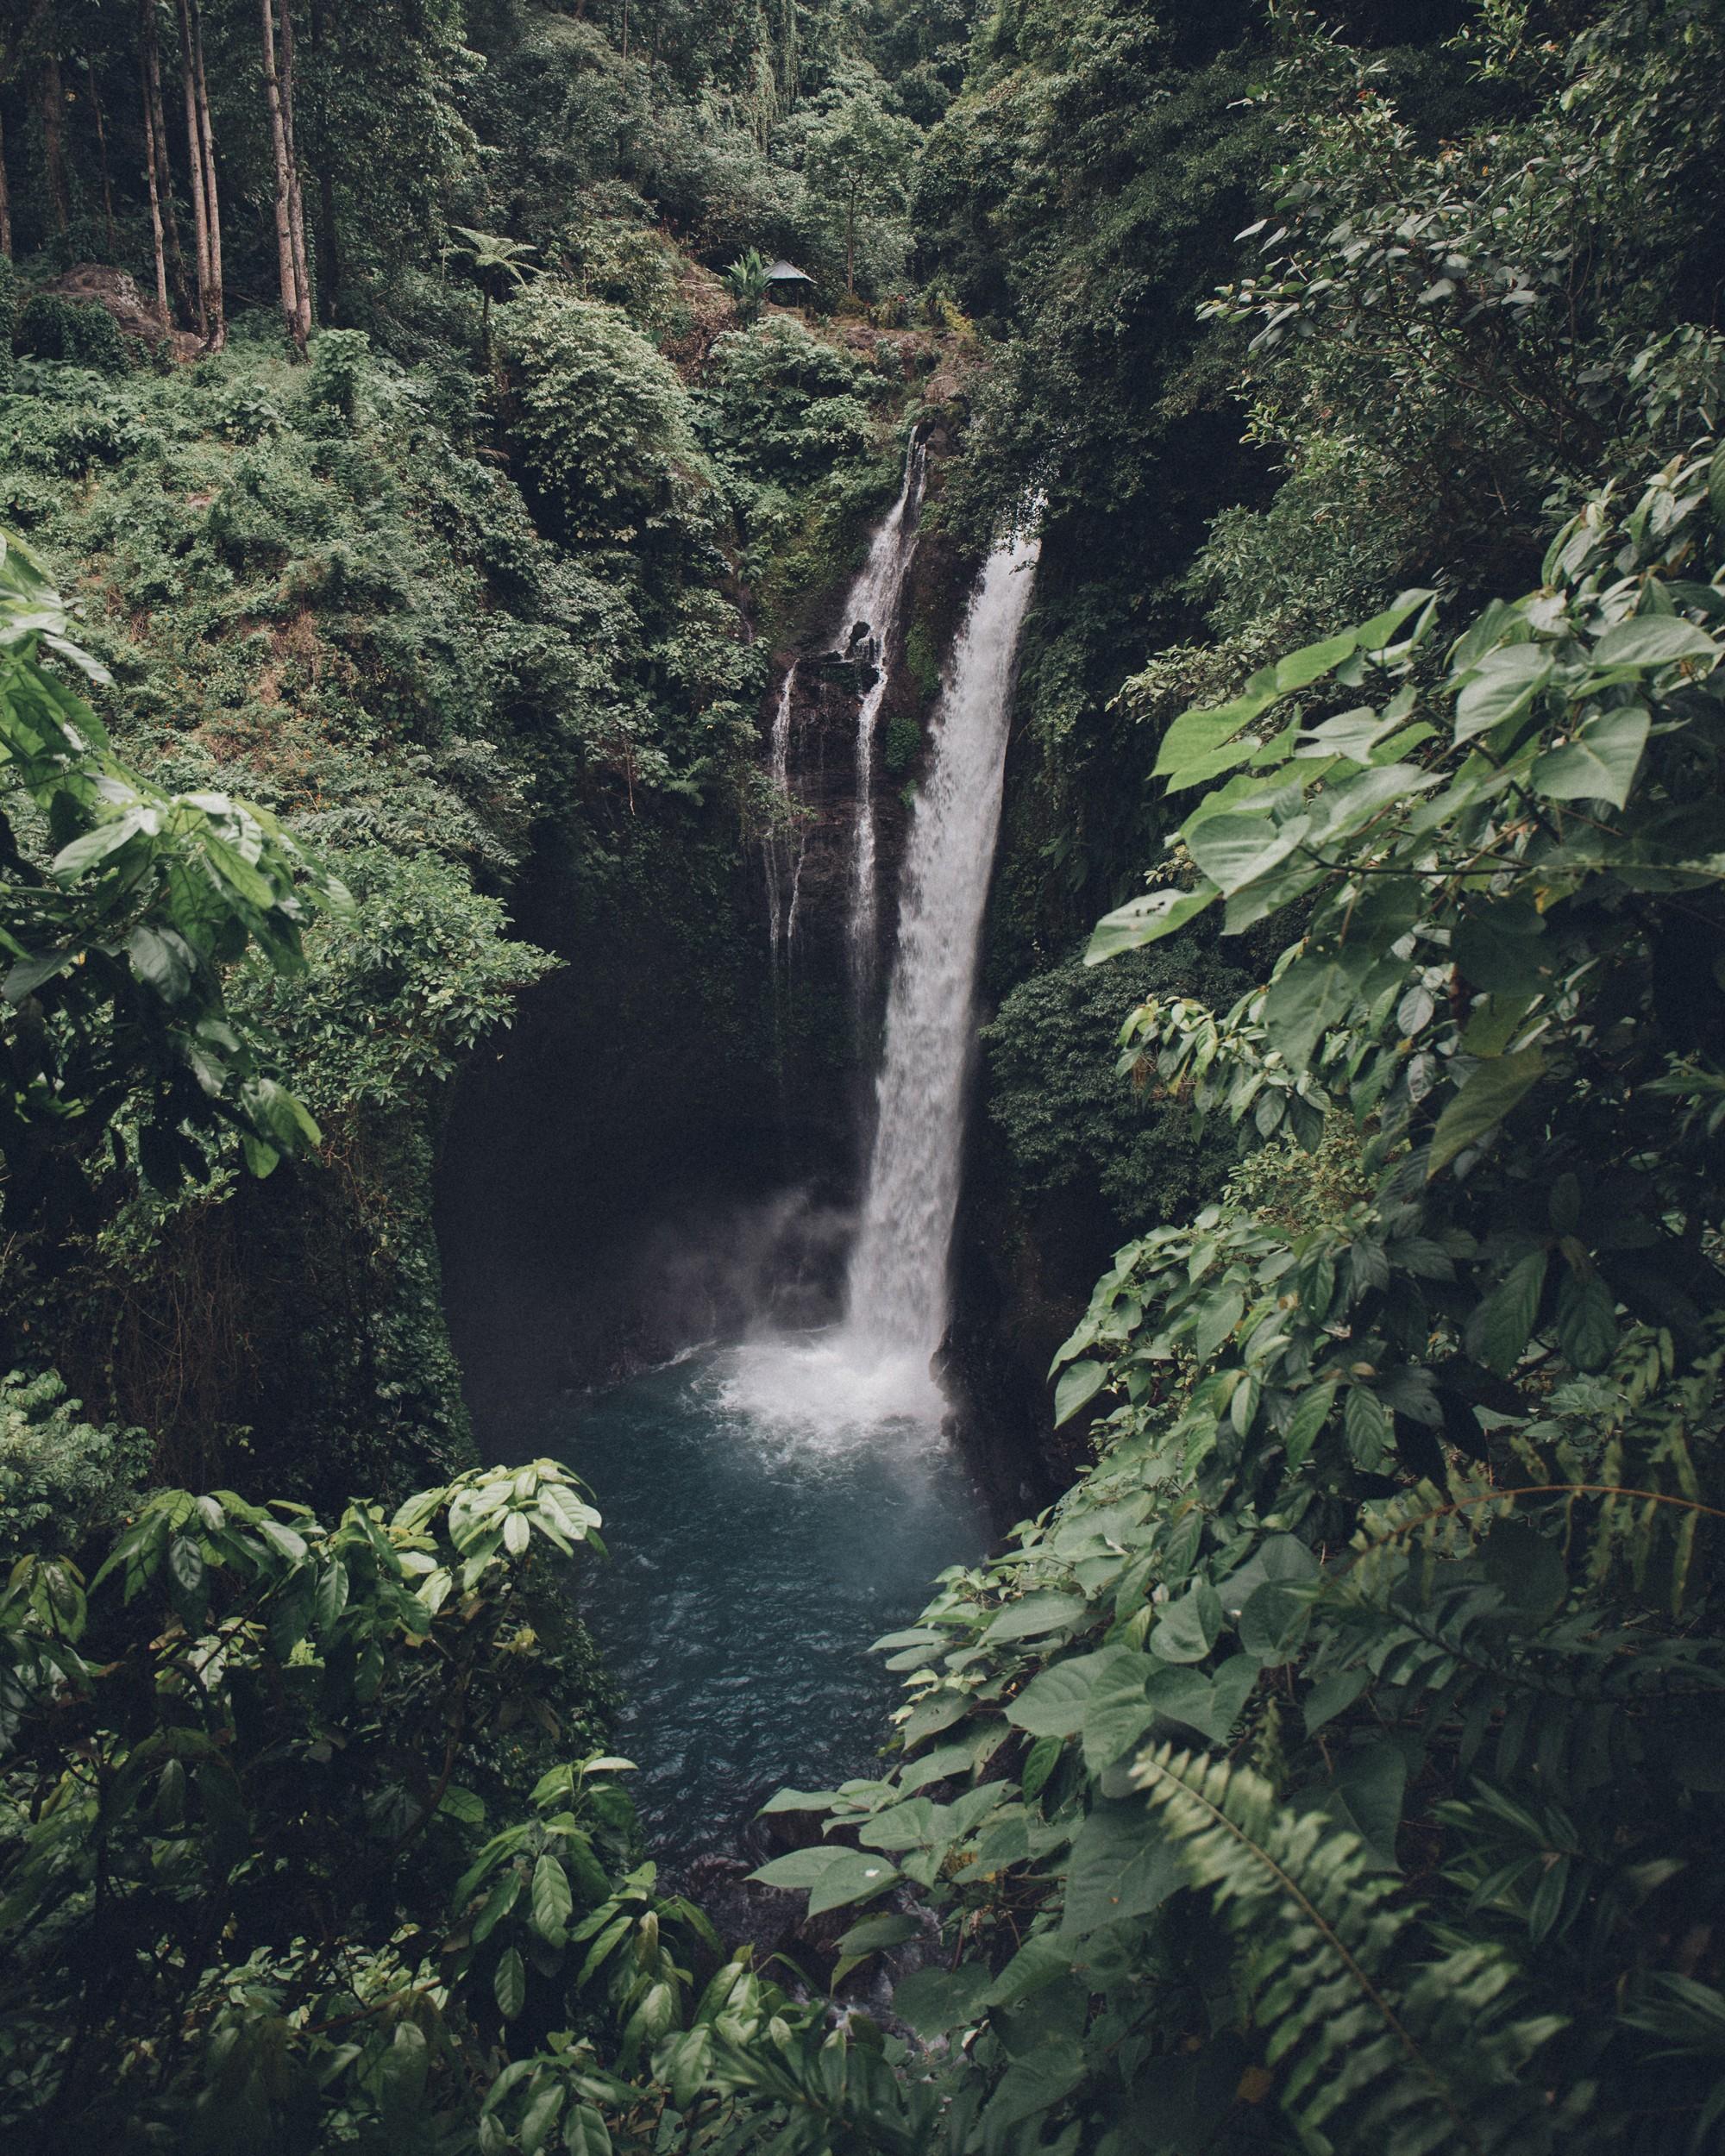 Jl. Raya Desa Sambangan, Sambangan, Sukasada, Kabupaten Buleleng, Bali 81161, Indonesia